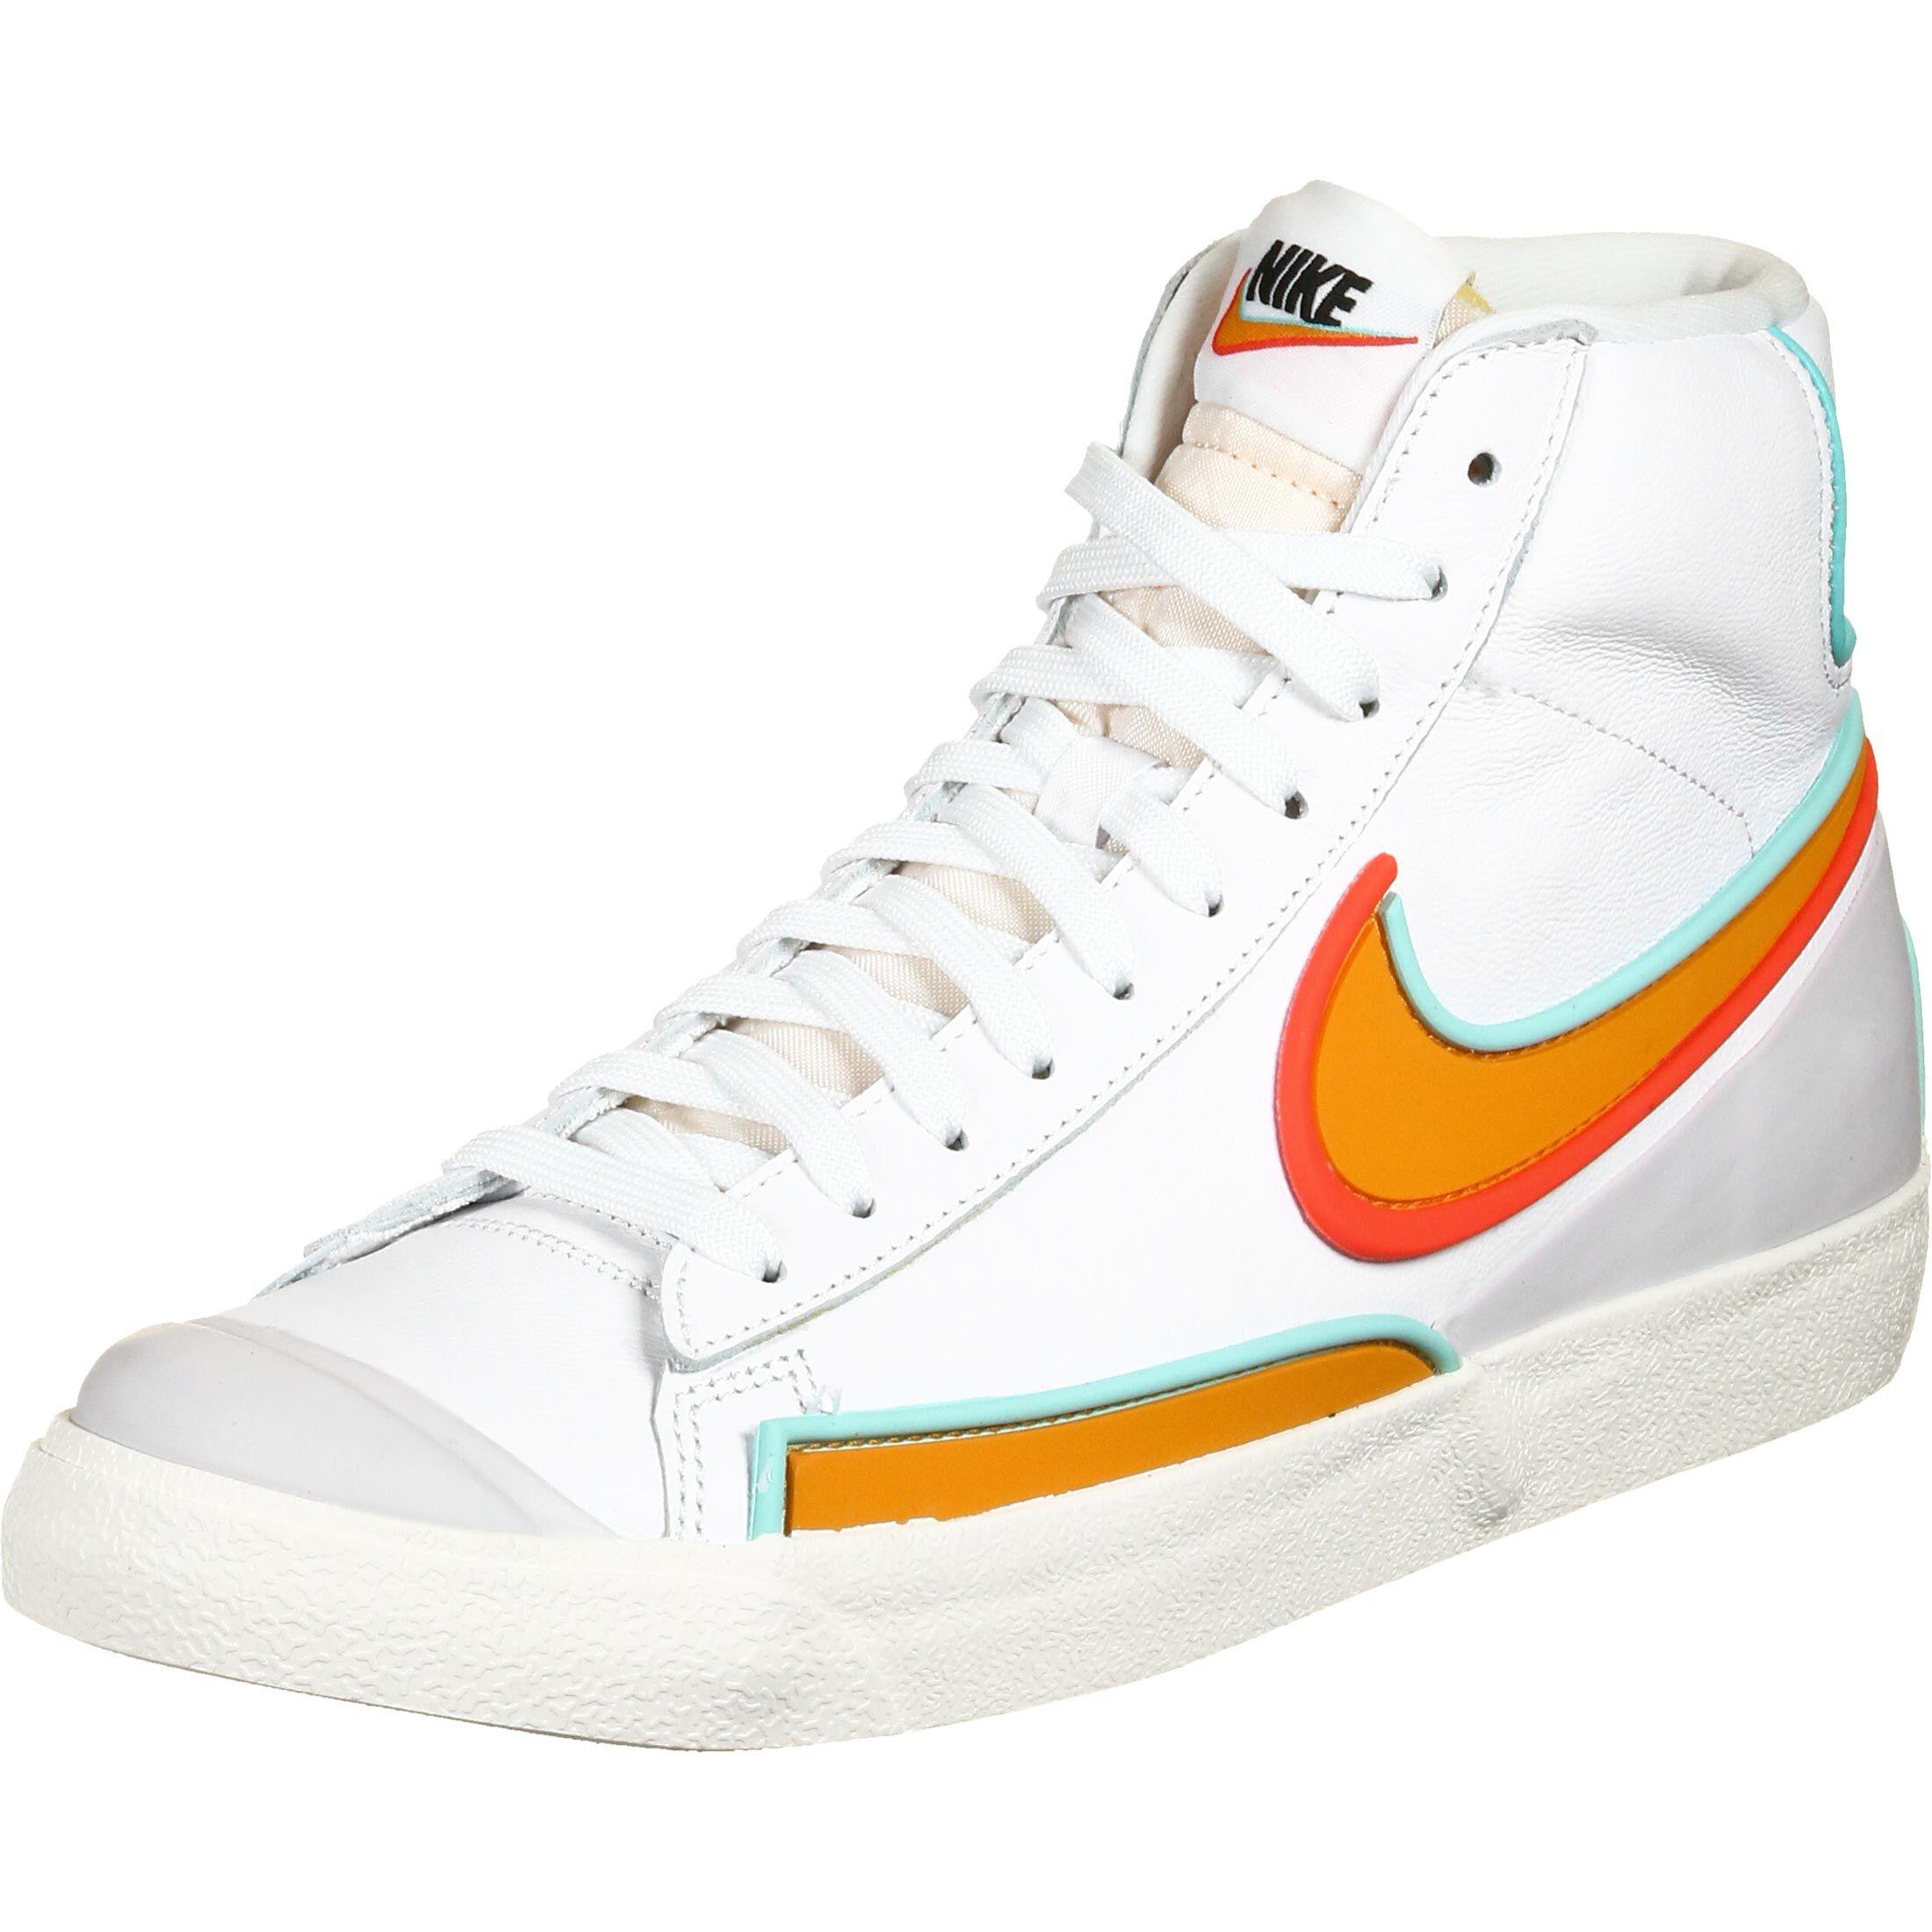 Nike Blazer Mid 77 Infinite - Sneakers Low at Stylefile